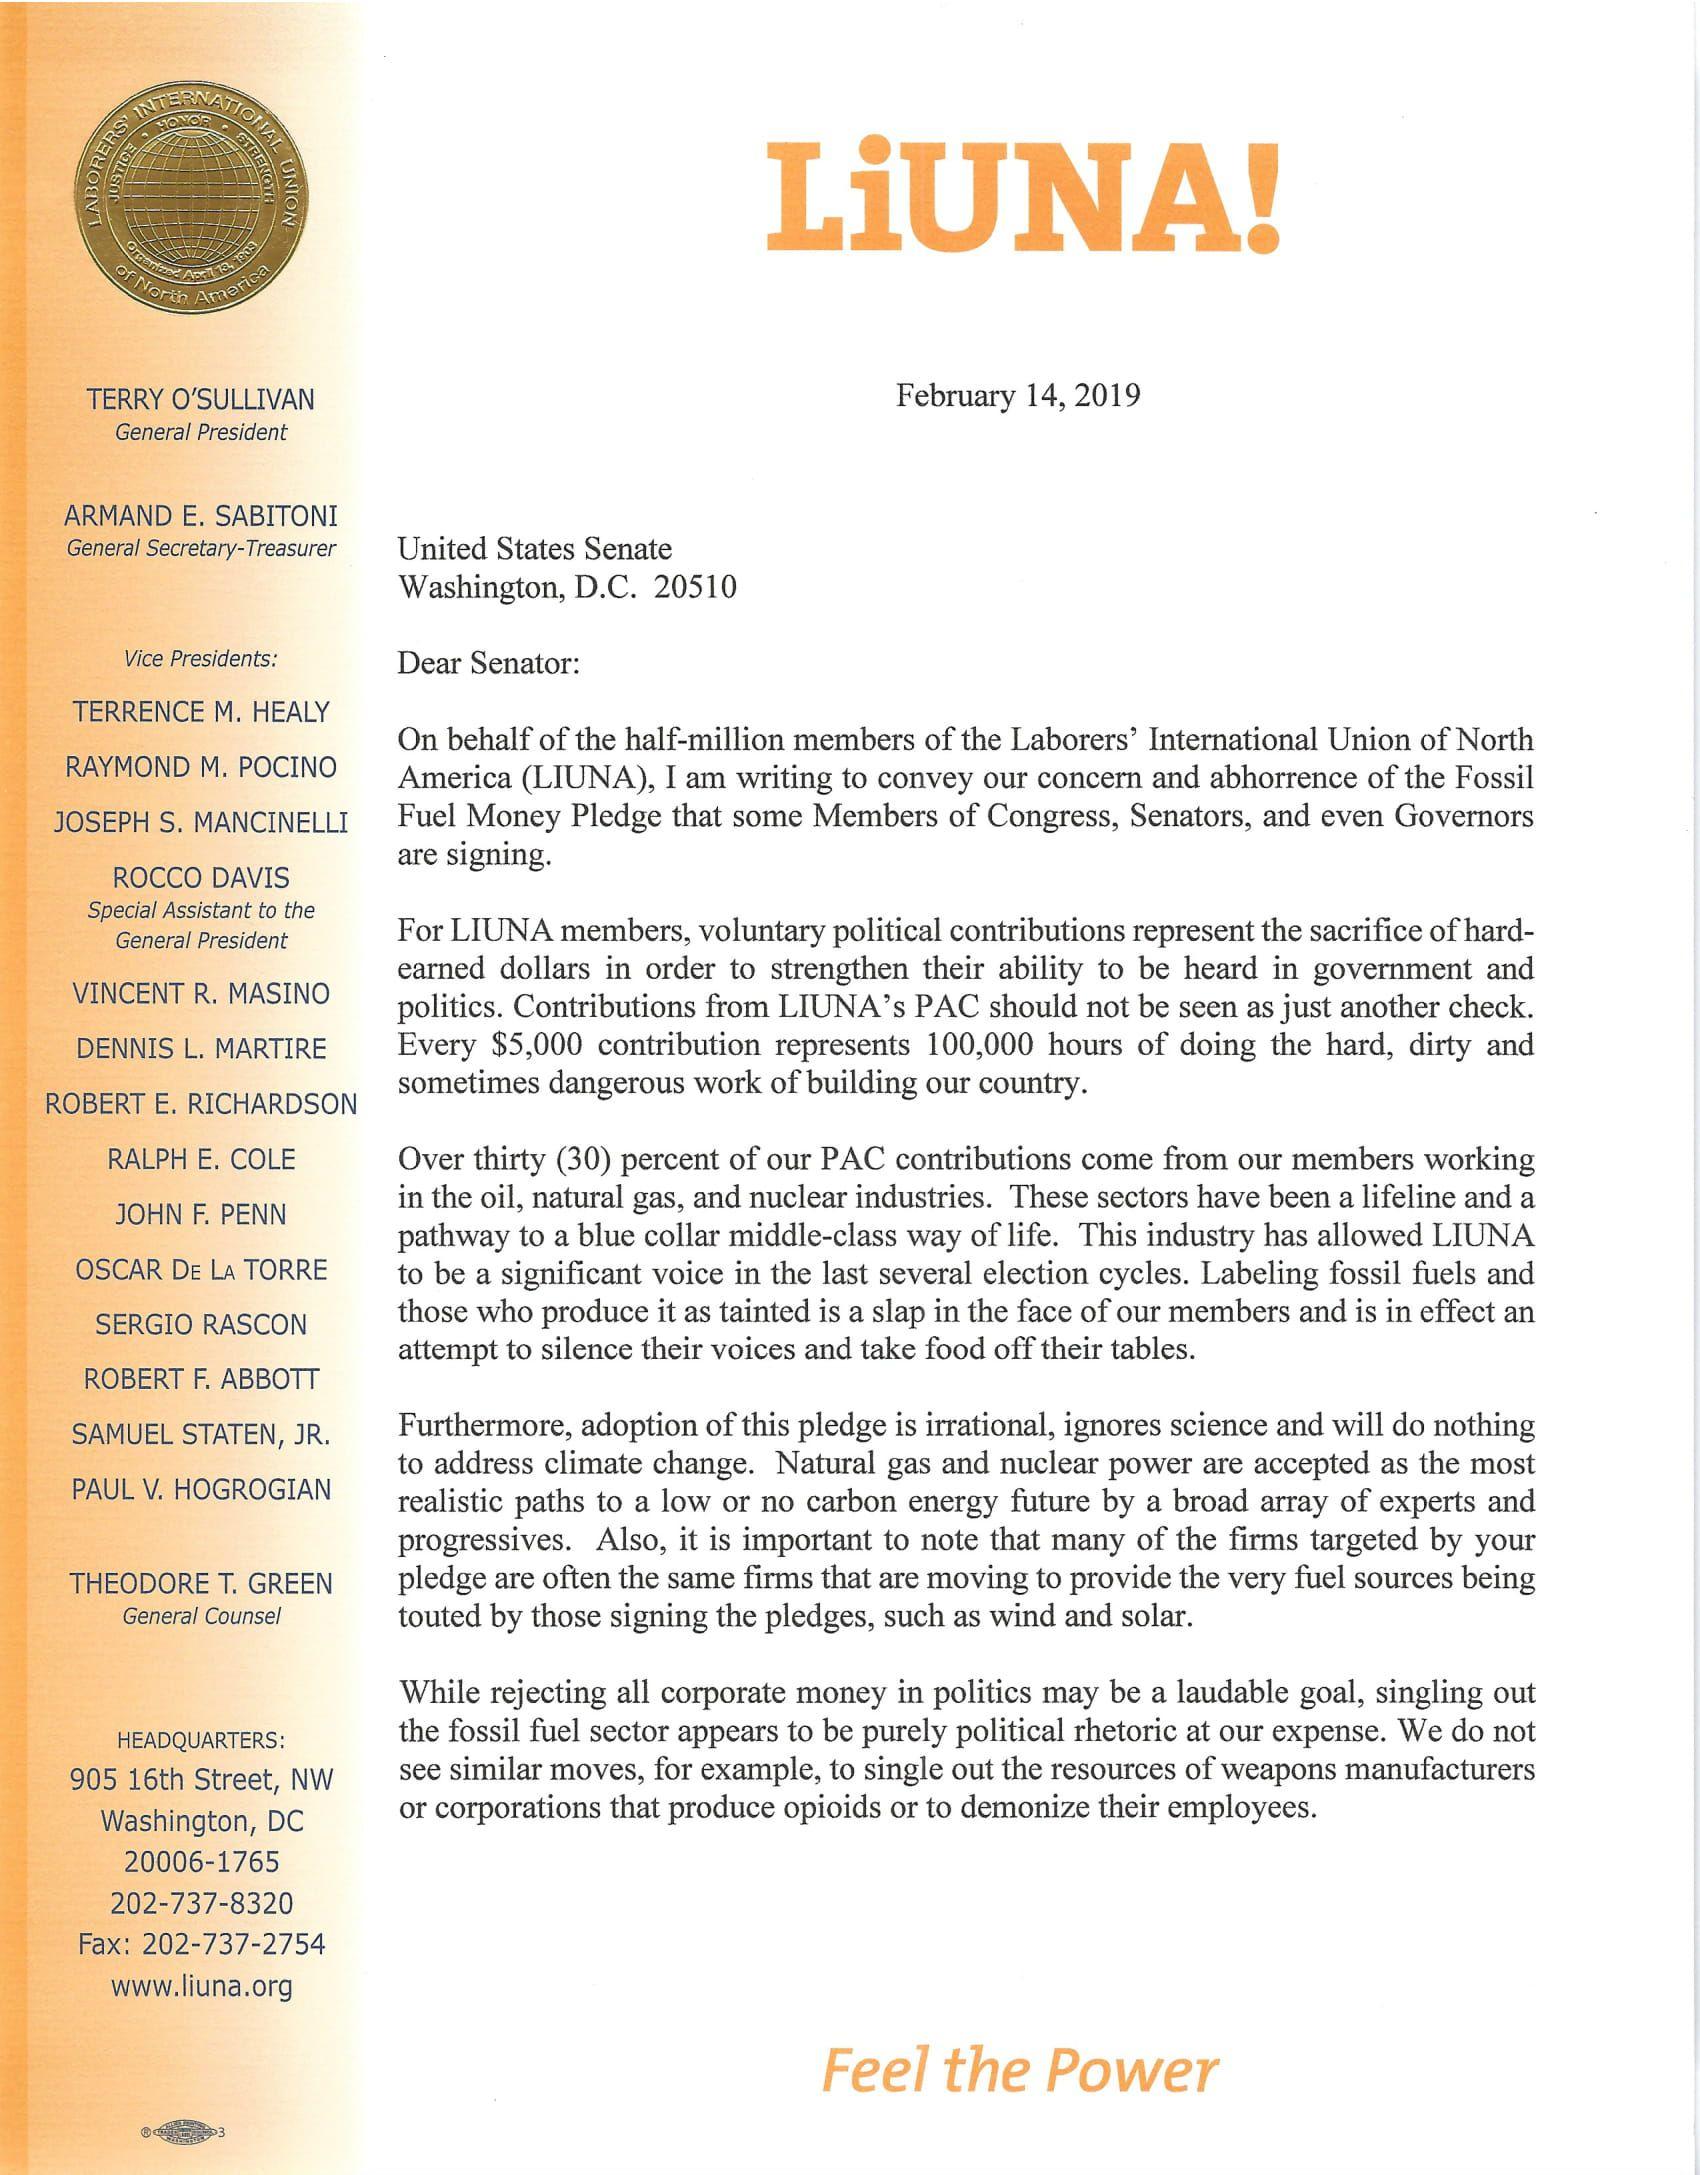 Senate Fossil Fuel Money Pledge Ltr Feb 2019-1.jpg